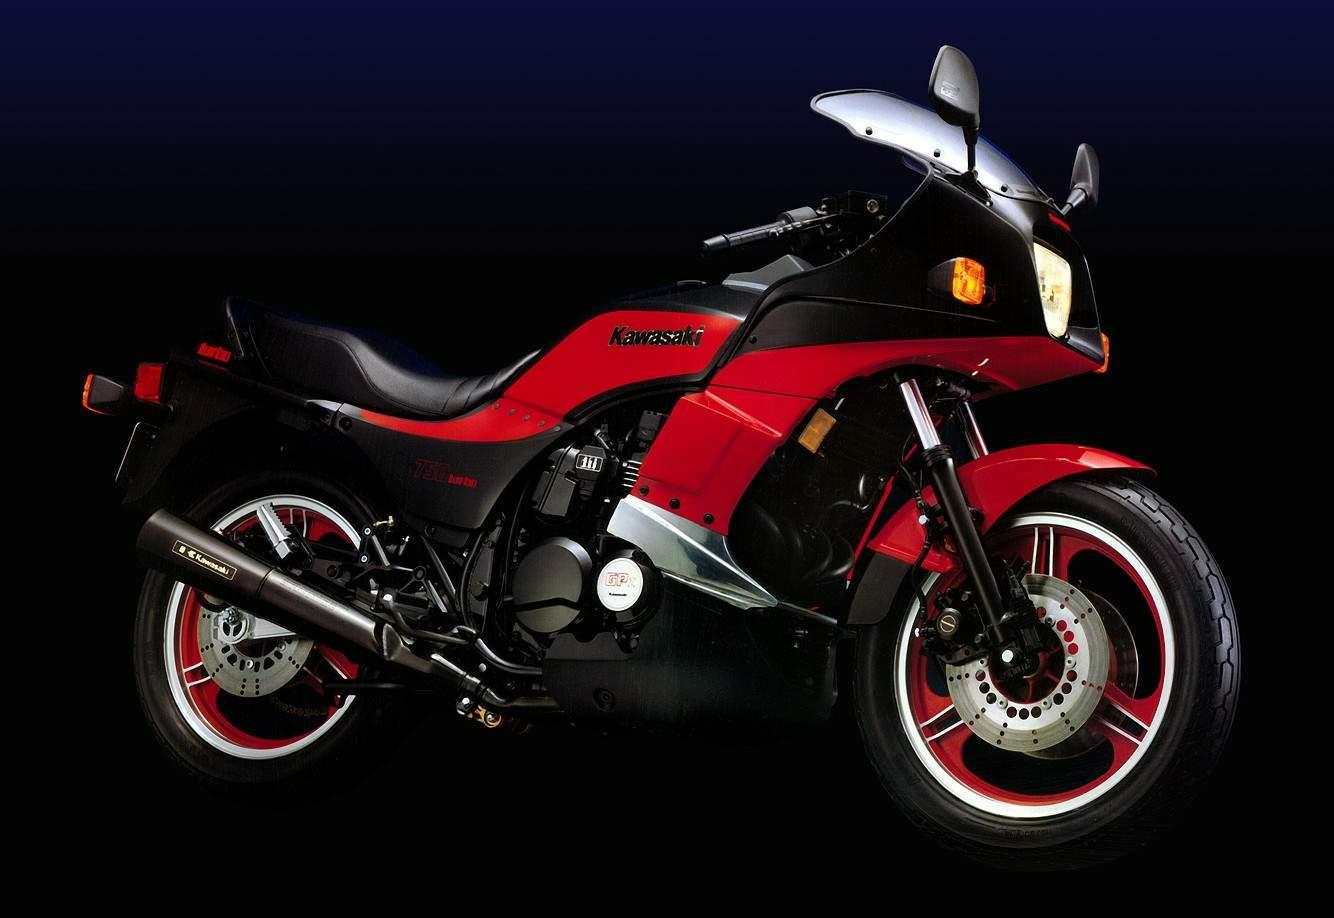 Kawasaki Gpz  Turbo Price